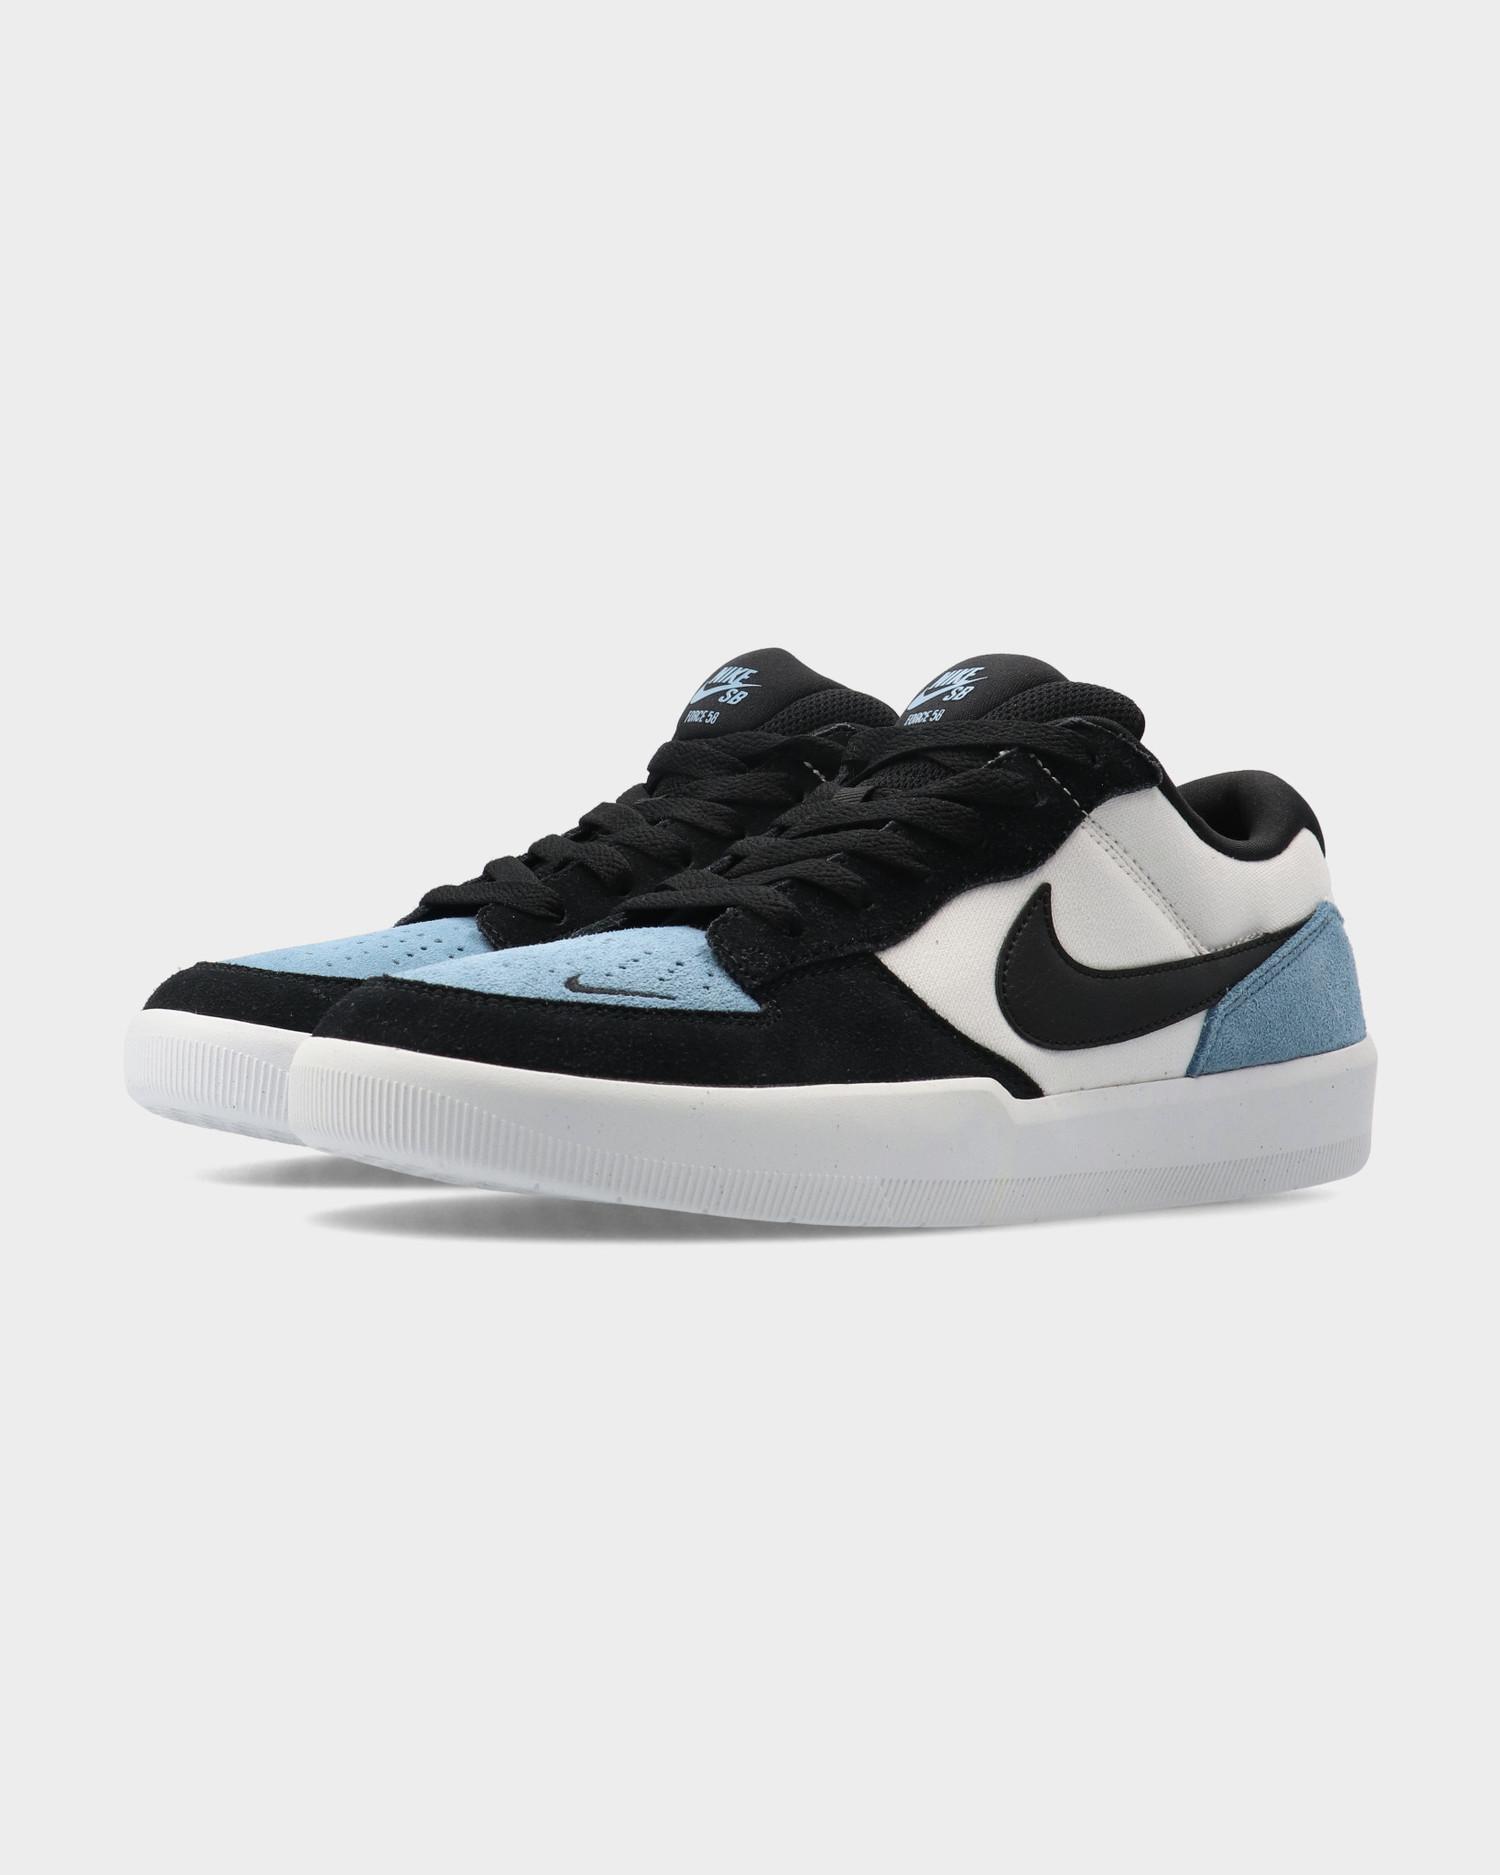 Nike SB Force 58 Dutch Blue/Black/White